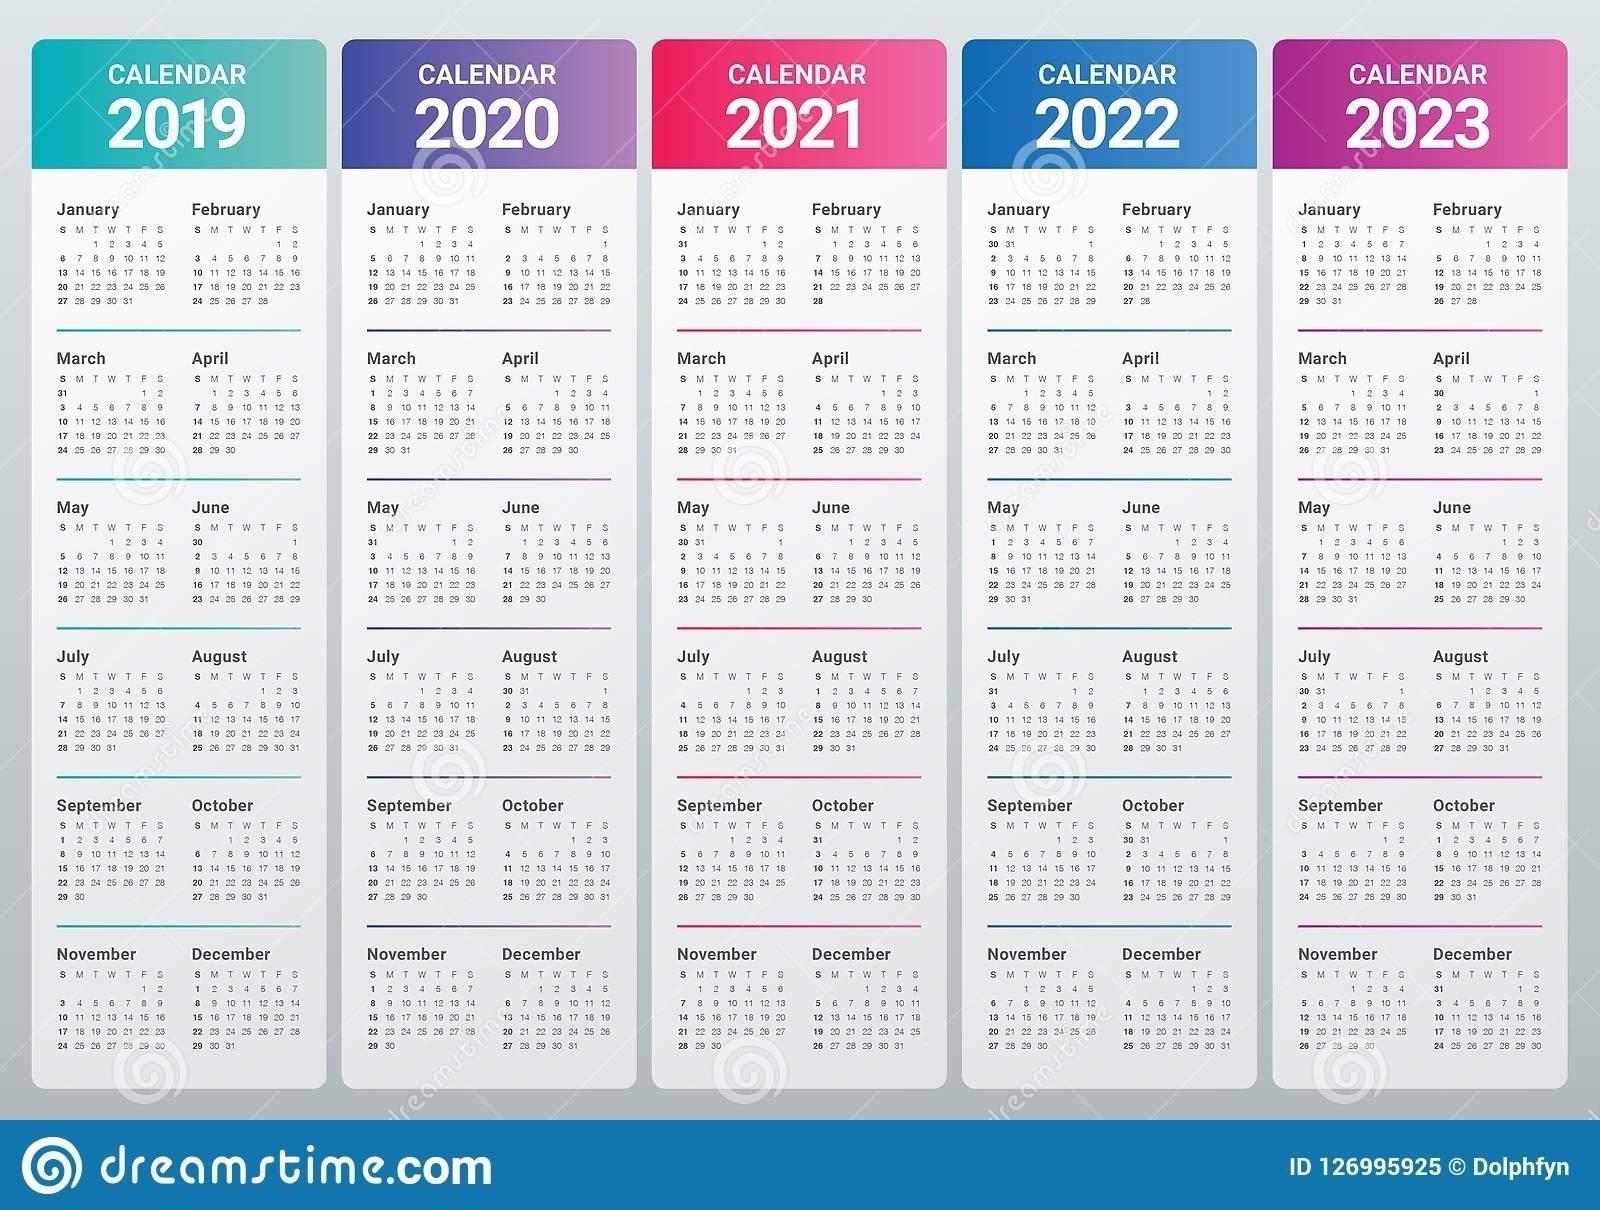 Printable Calendar 2020 2021 2022 2023 - Calendar